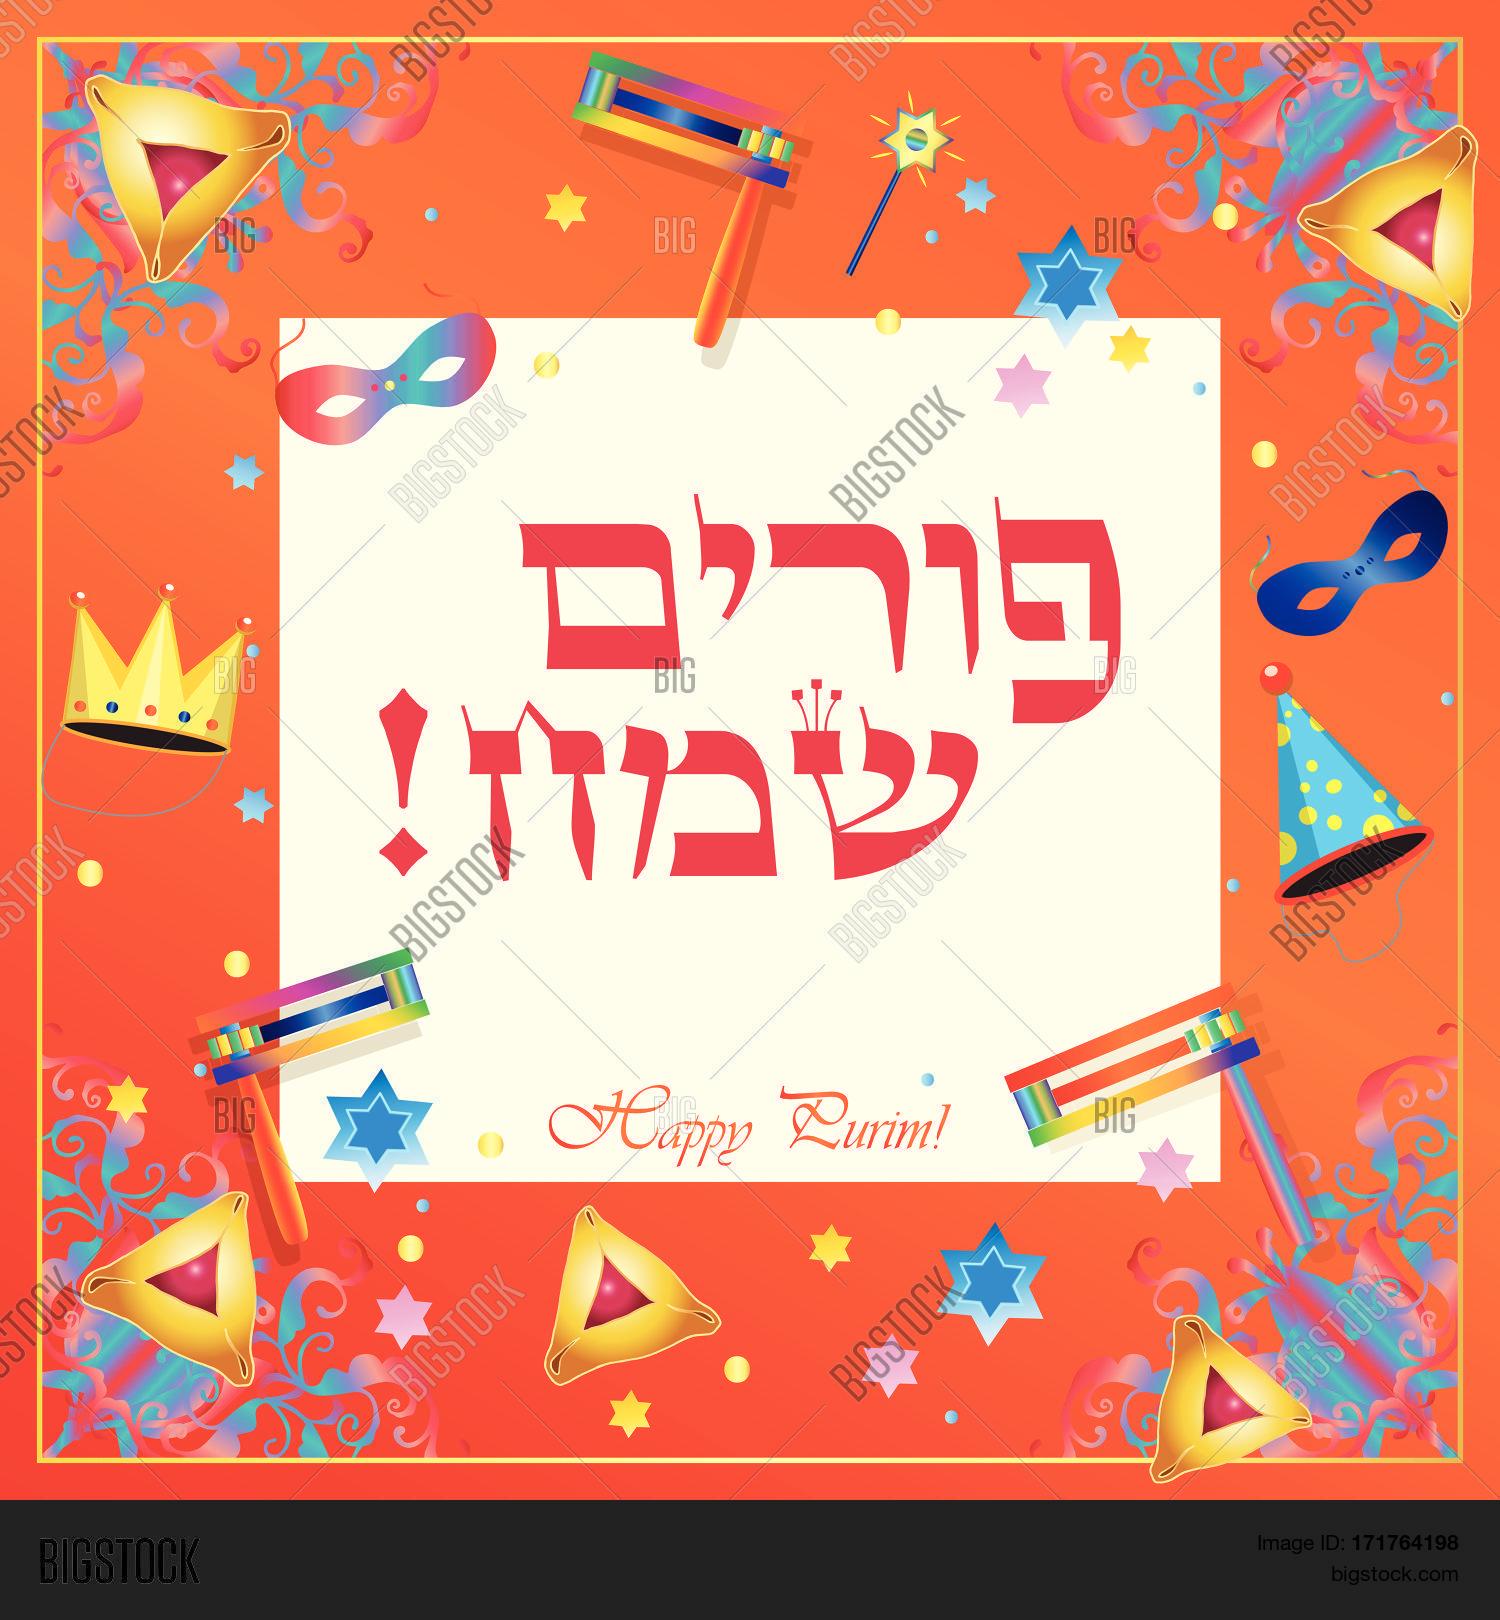 Happy purim festival vector photo free trial bigstock happy purim festival greeting card frame translation from hebrew happy purim purim jewish m4hsunfo